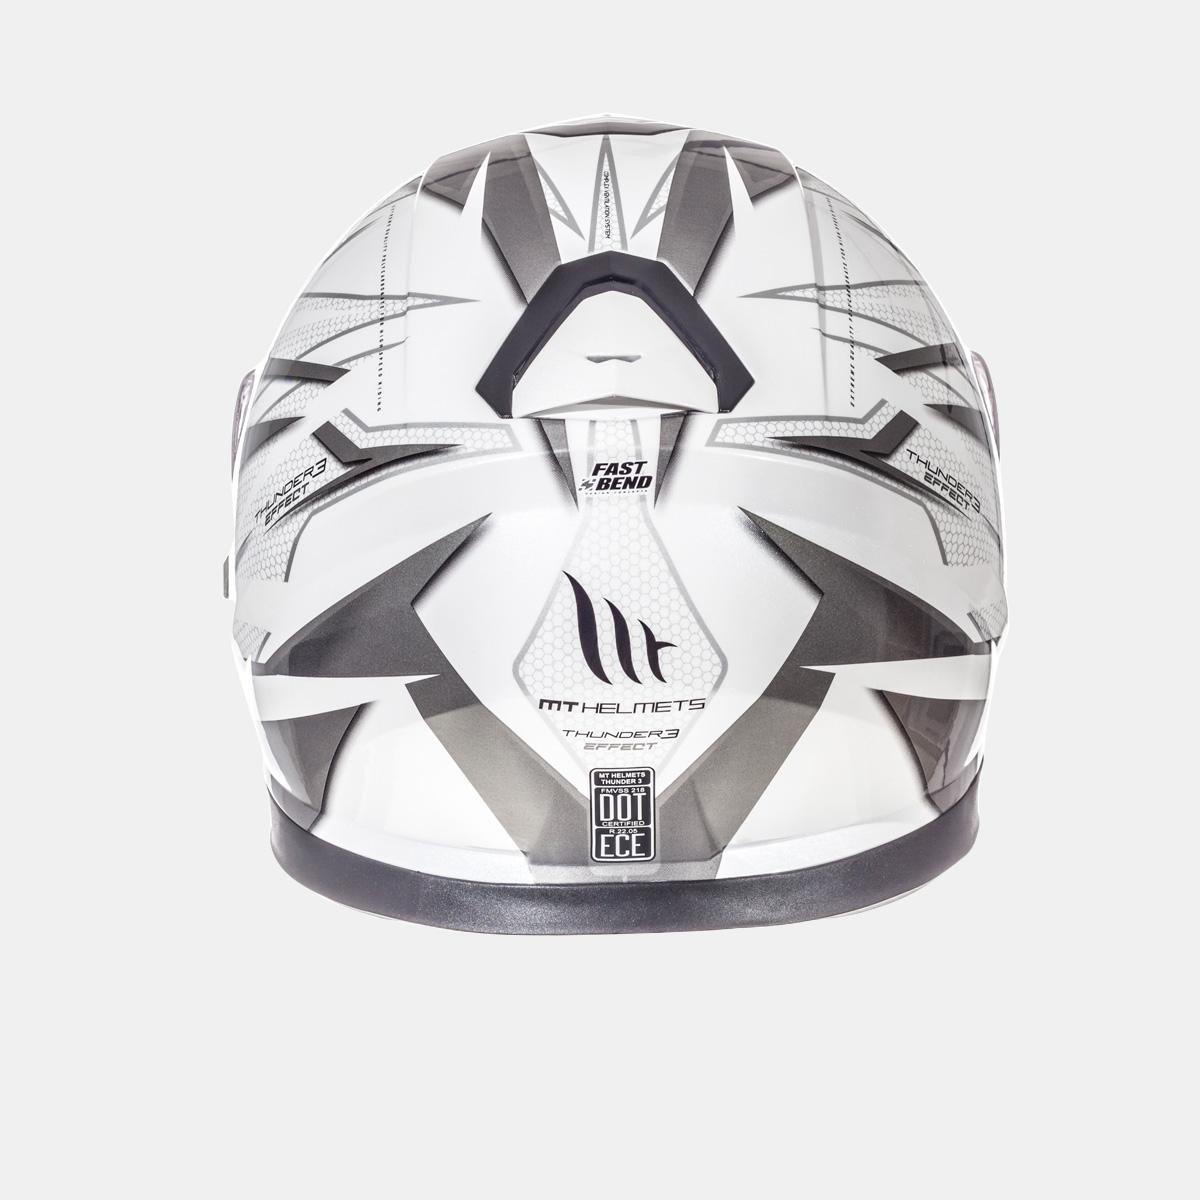 integralna kaciga thunder 3 effect gloss pearl white silver anthracite lavado hr 03 – kopija